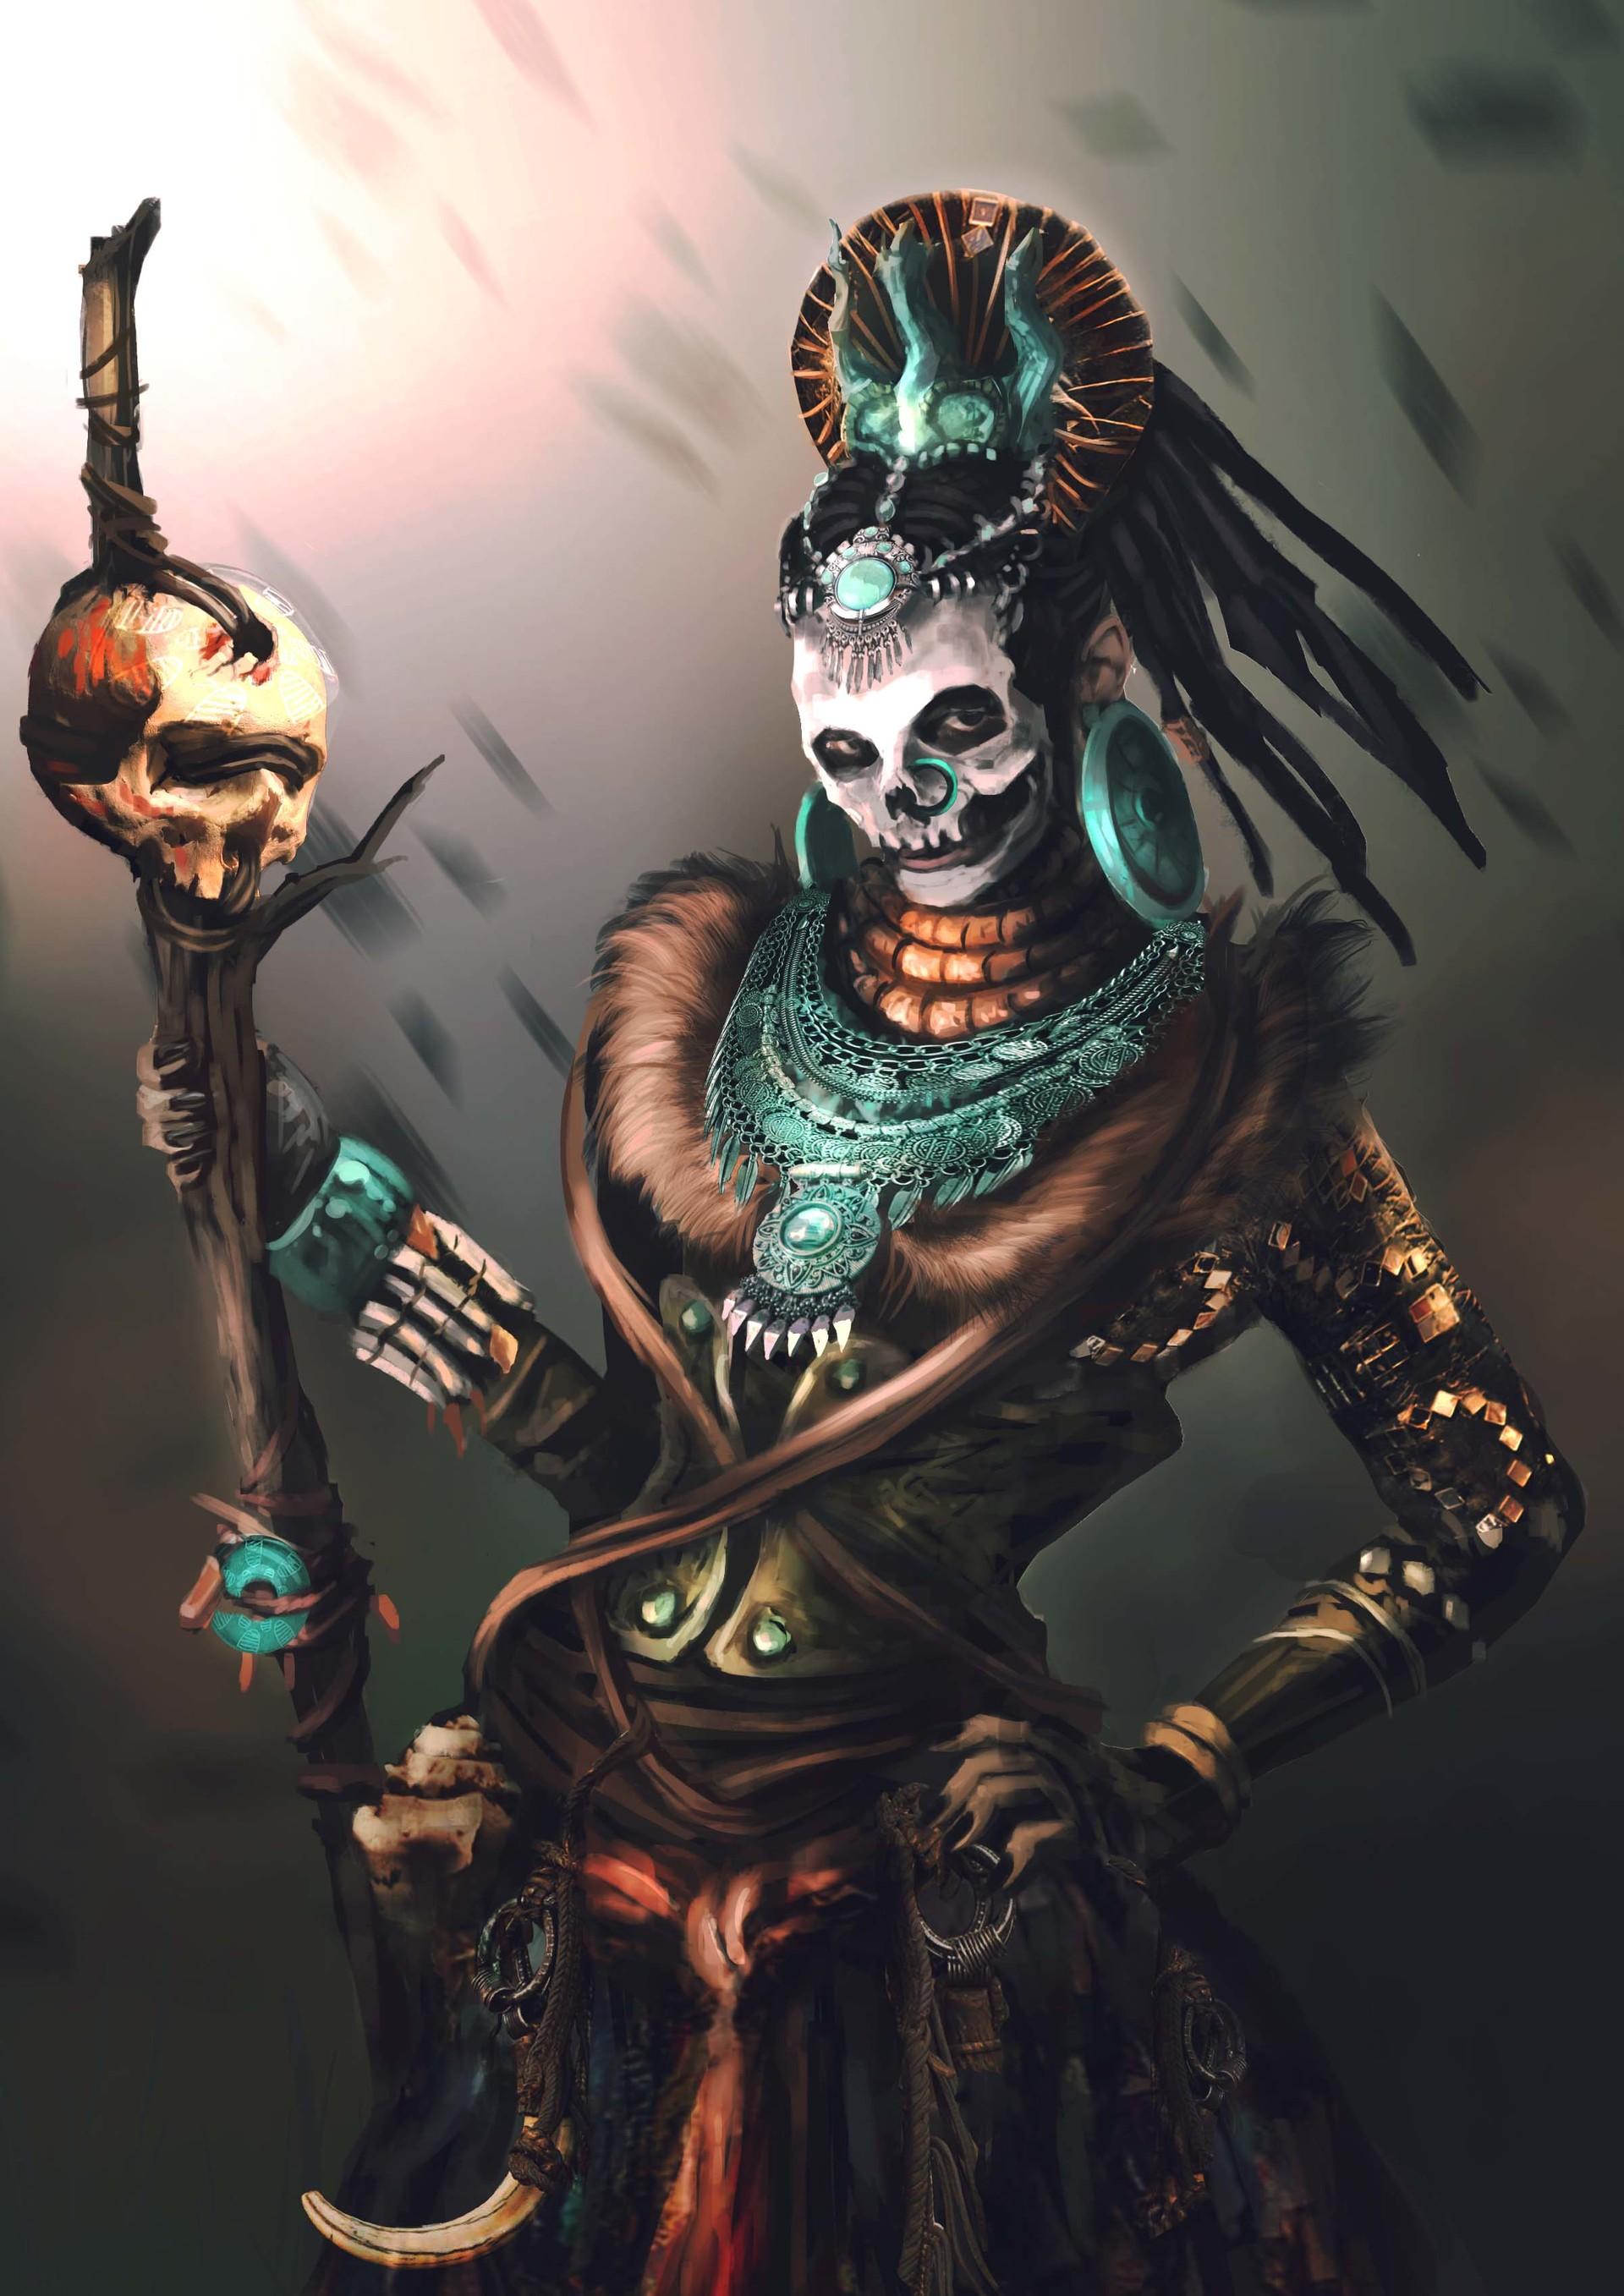 ArtStation-Voodoo-Priest-Inga-Siebert-wallpaper-wp4804344